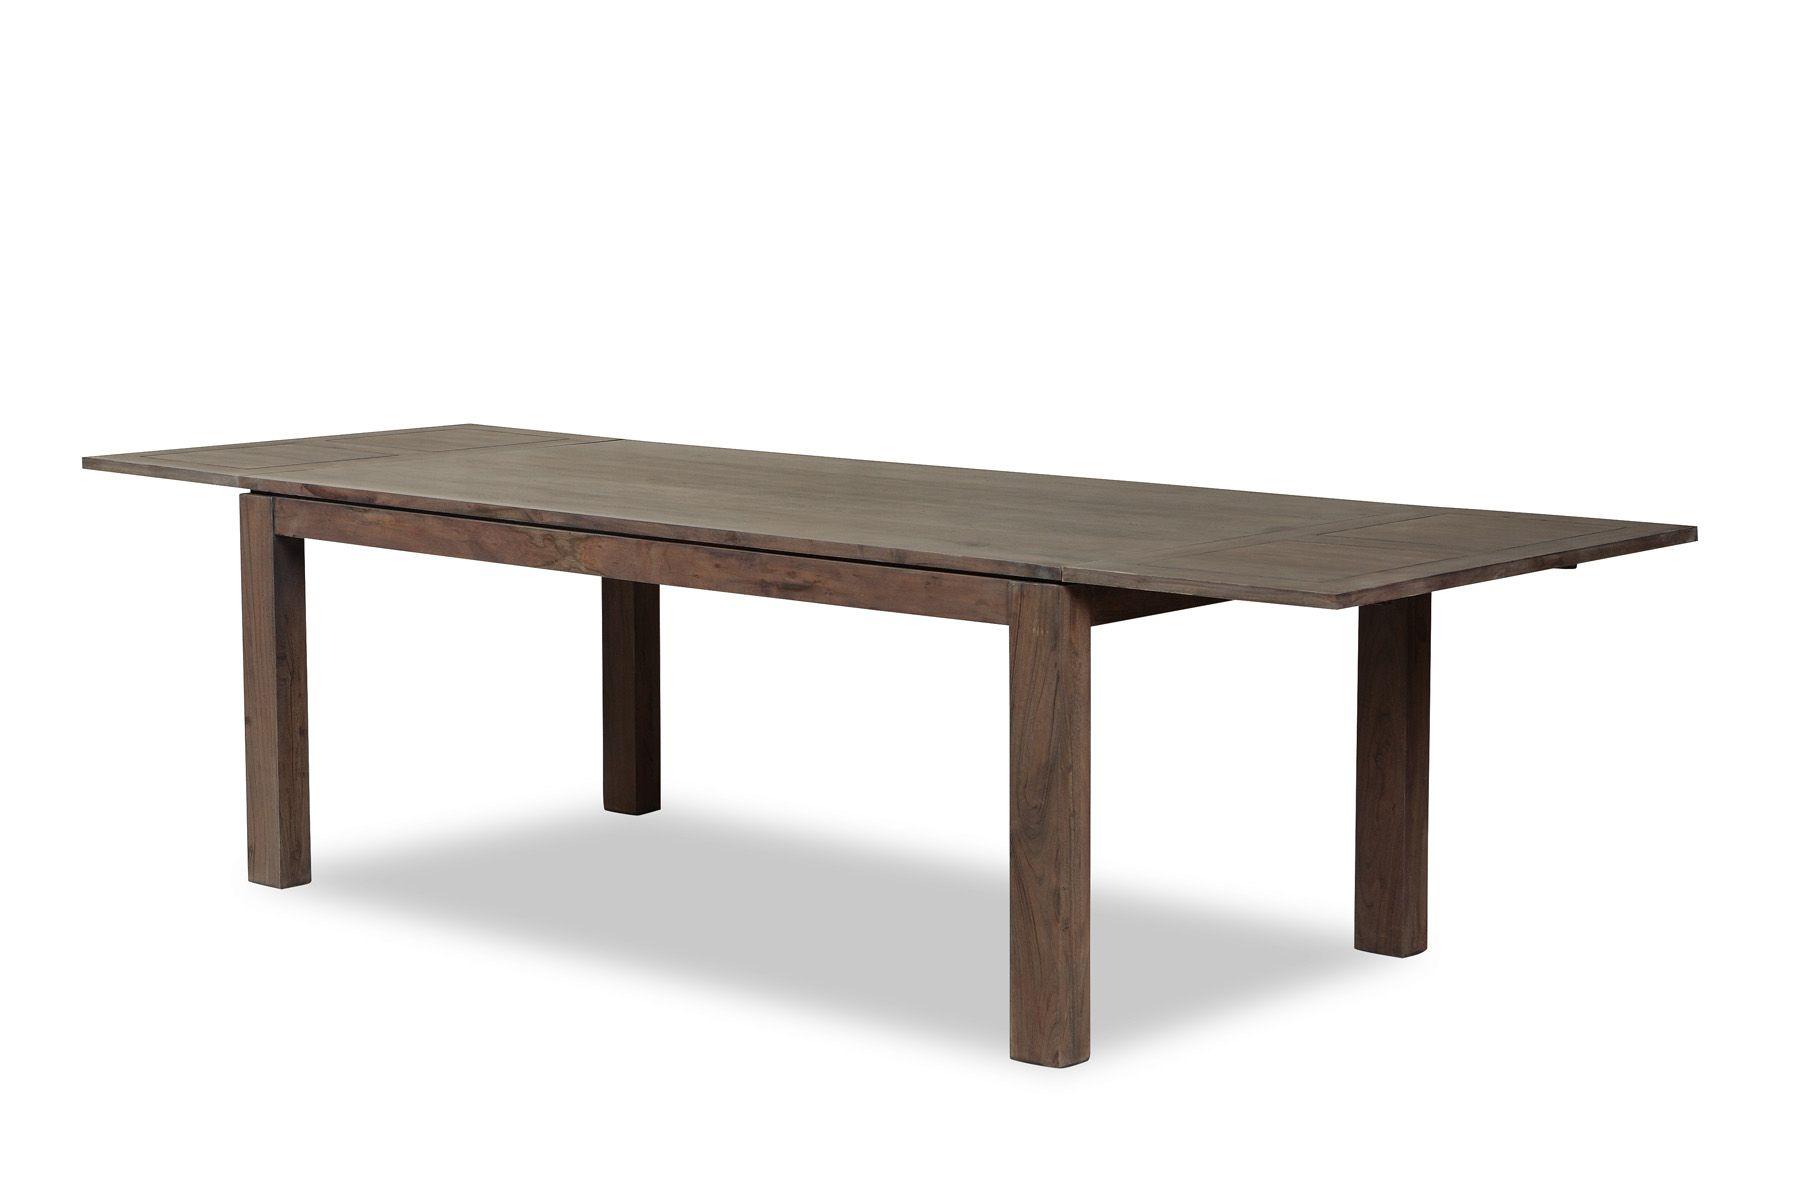 Table Repas Extensible 160 260cm Boreal Acacia Grise Table Repas